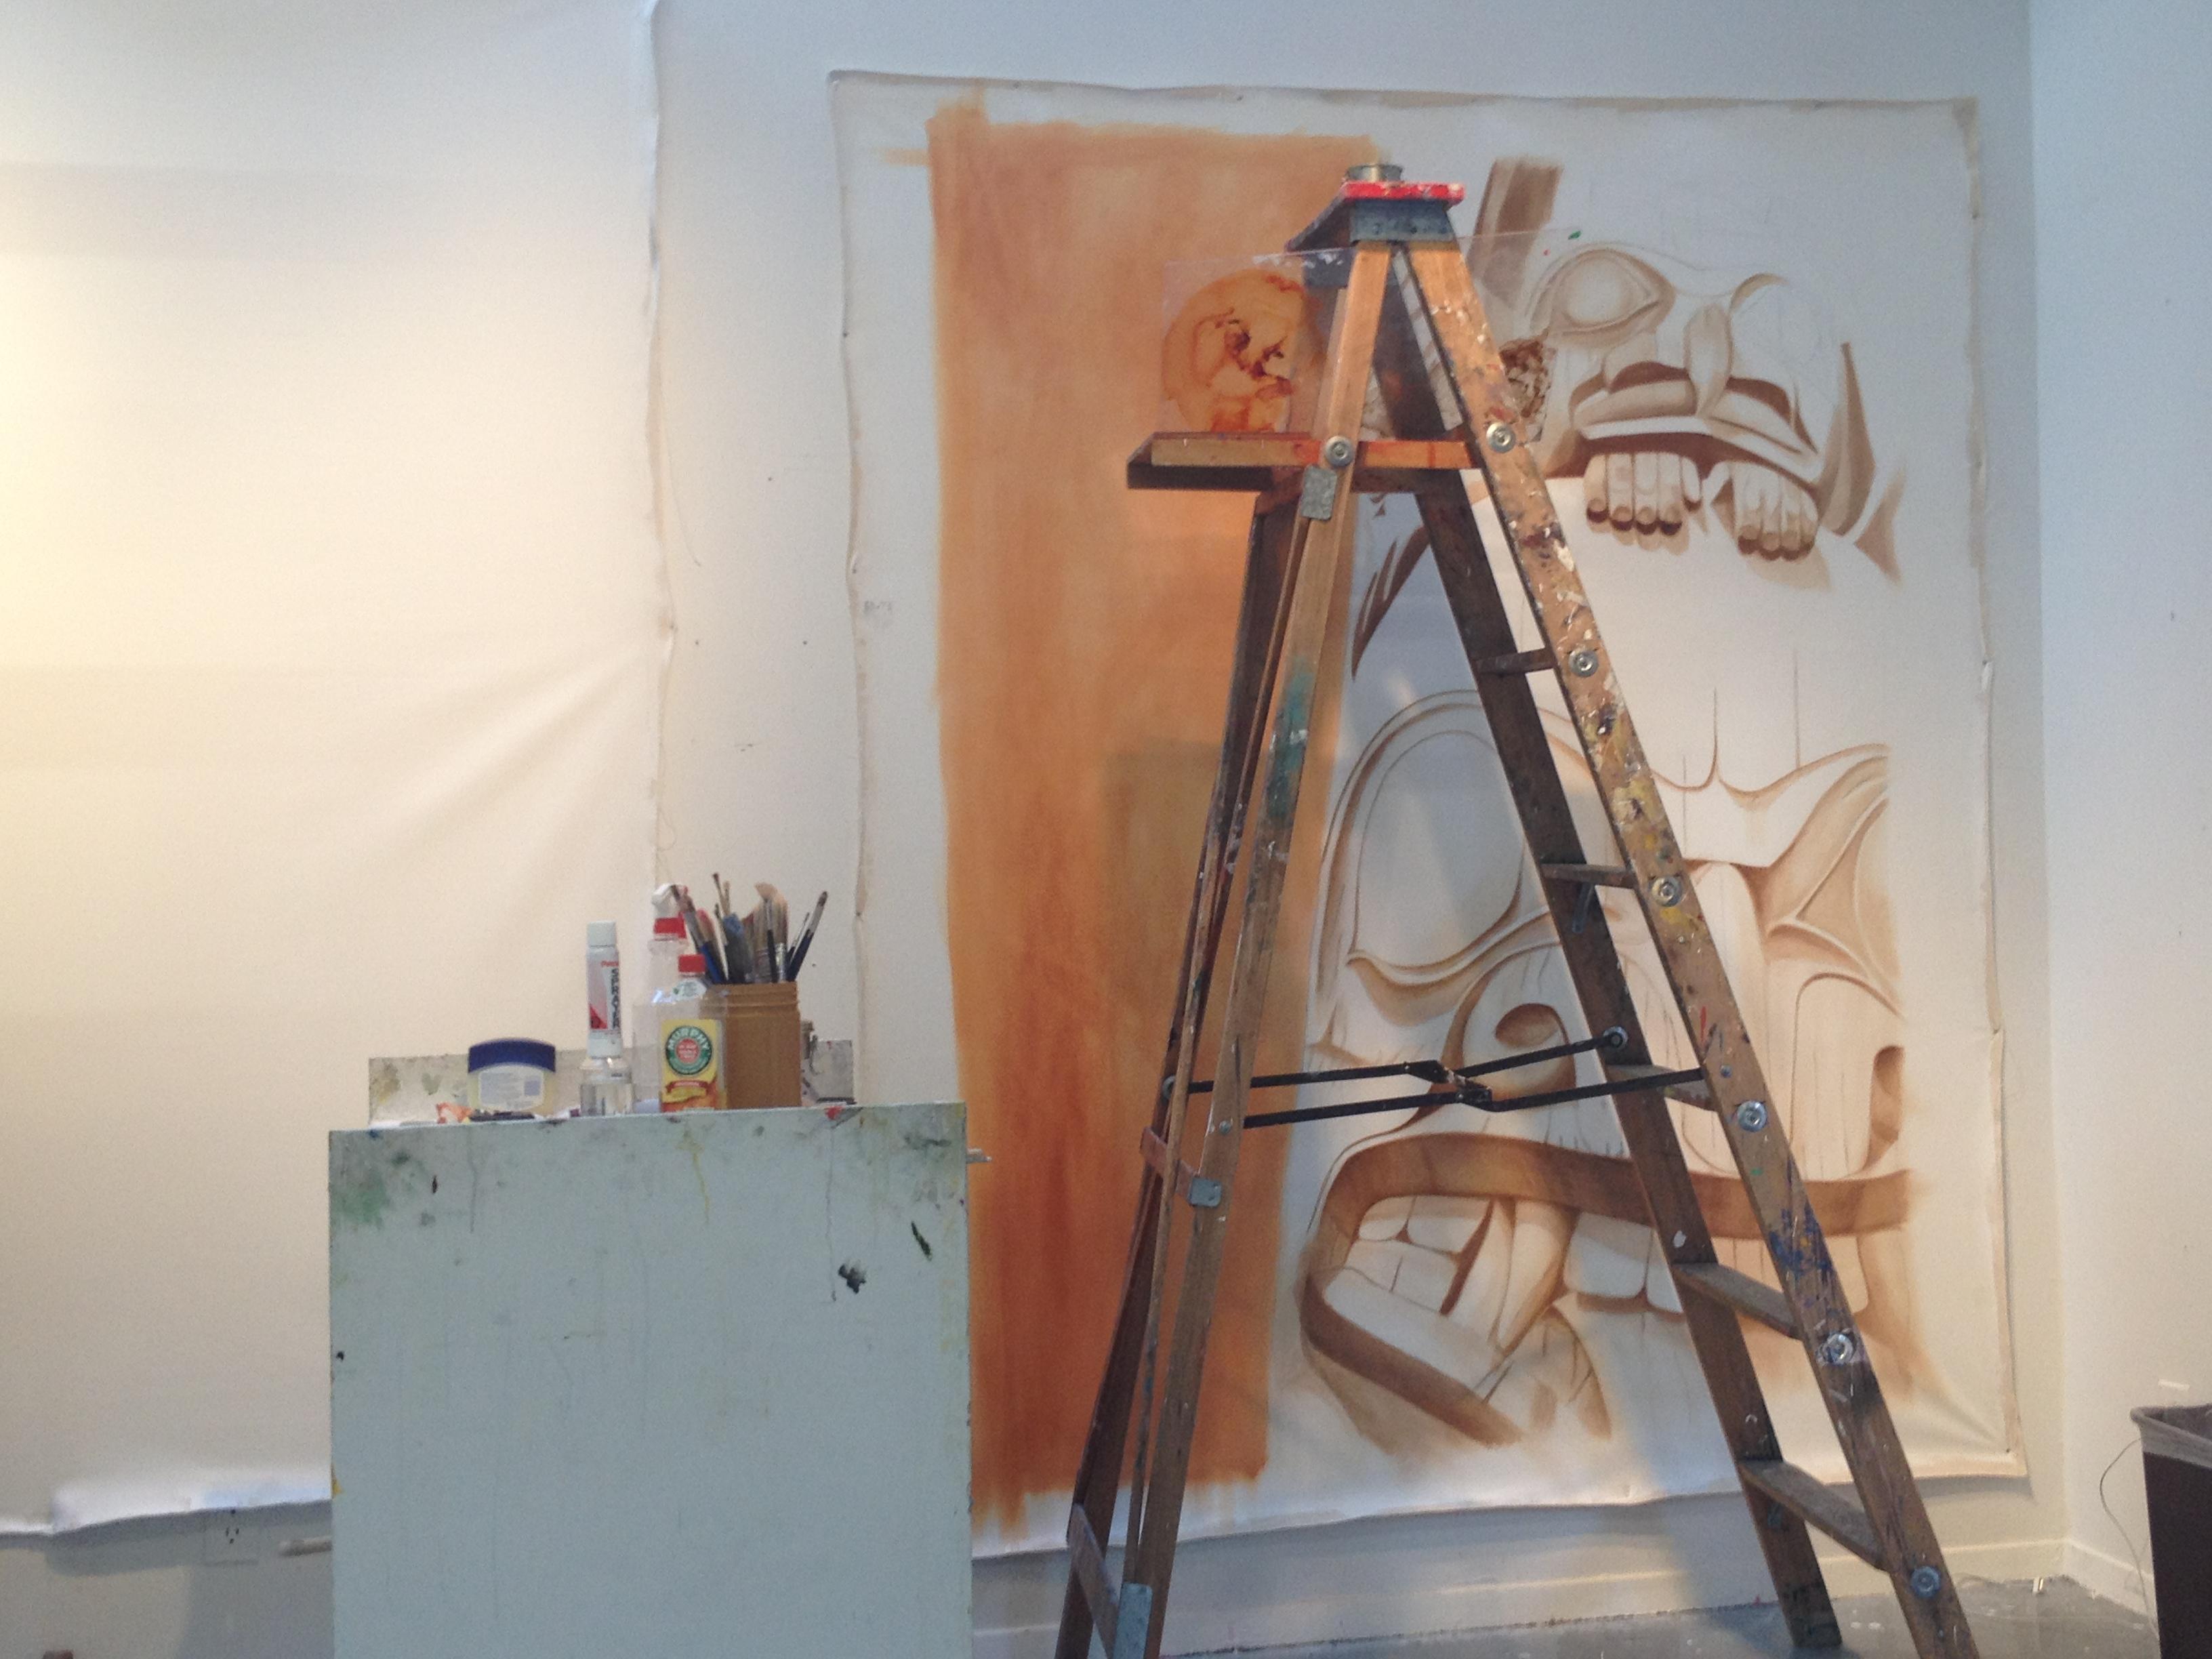 Work In Progress: Stage 2- Gerin-Lajoie Studio at The Banff Centre.